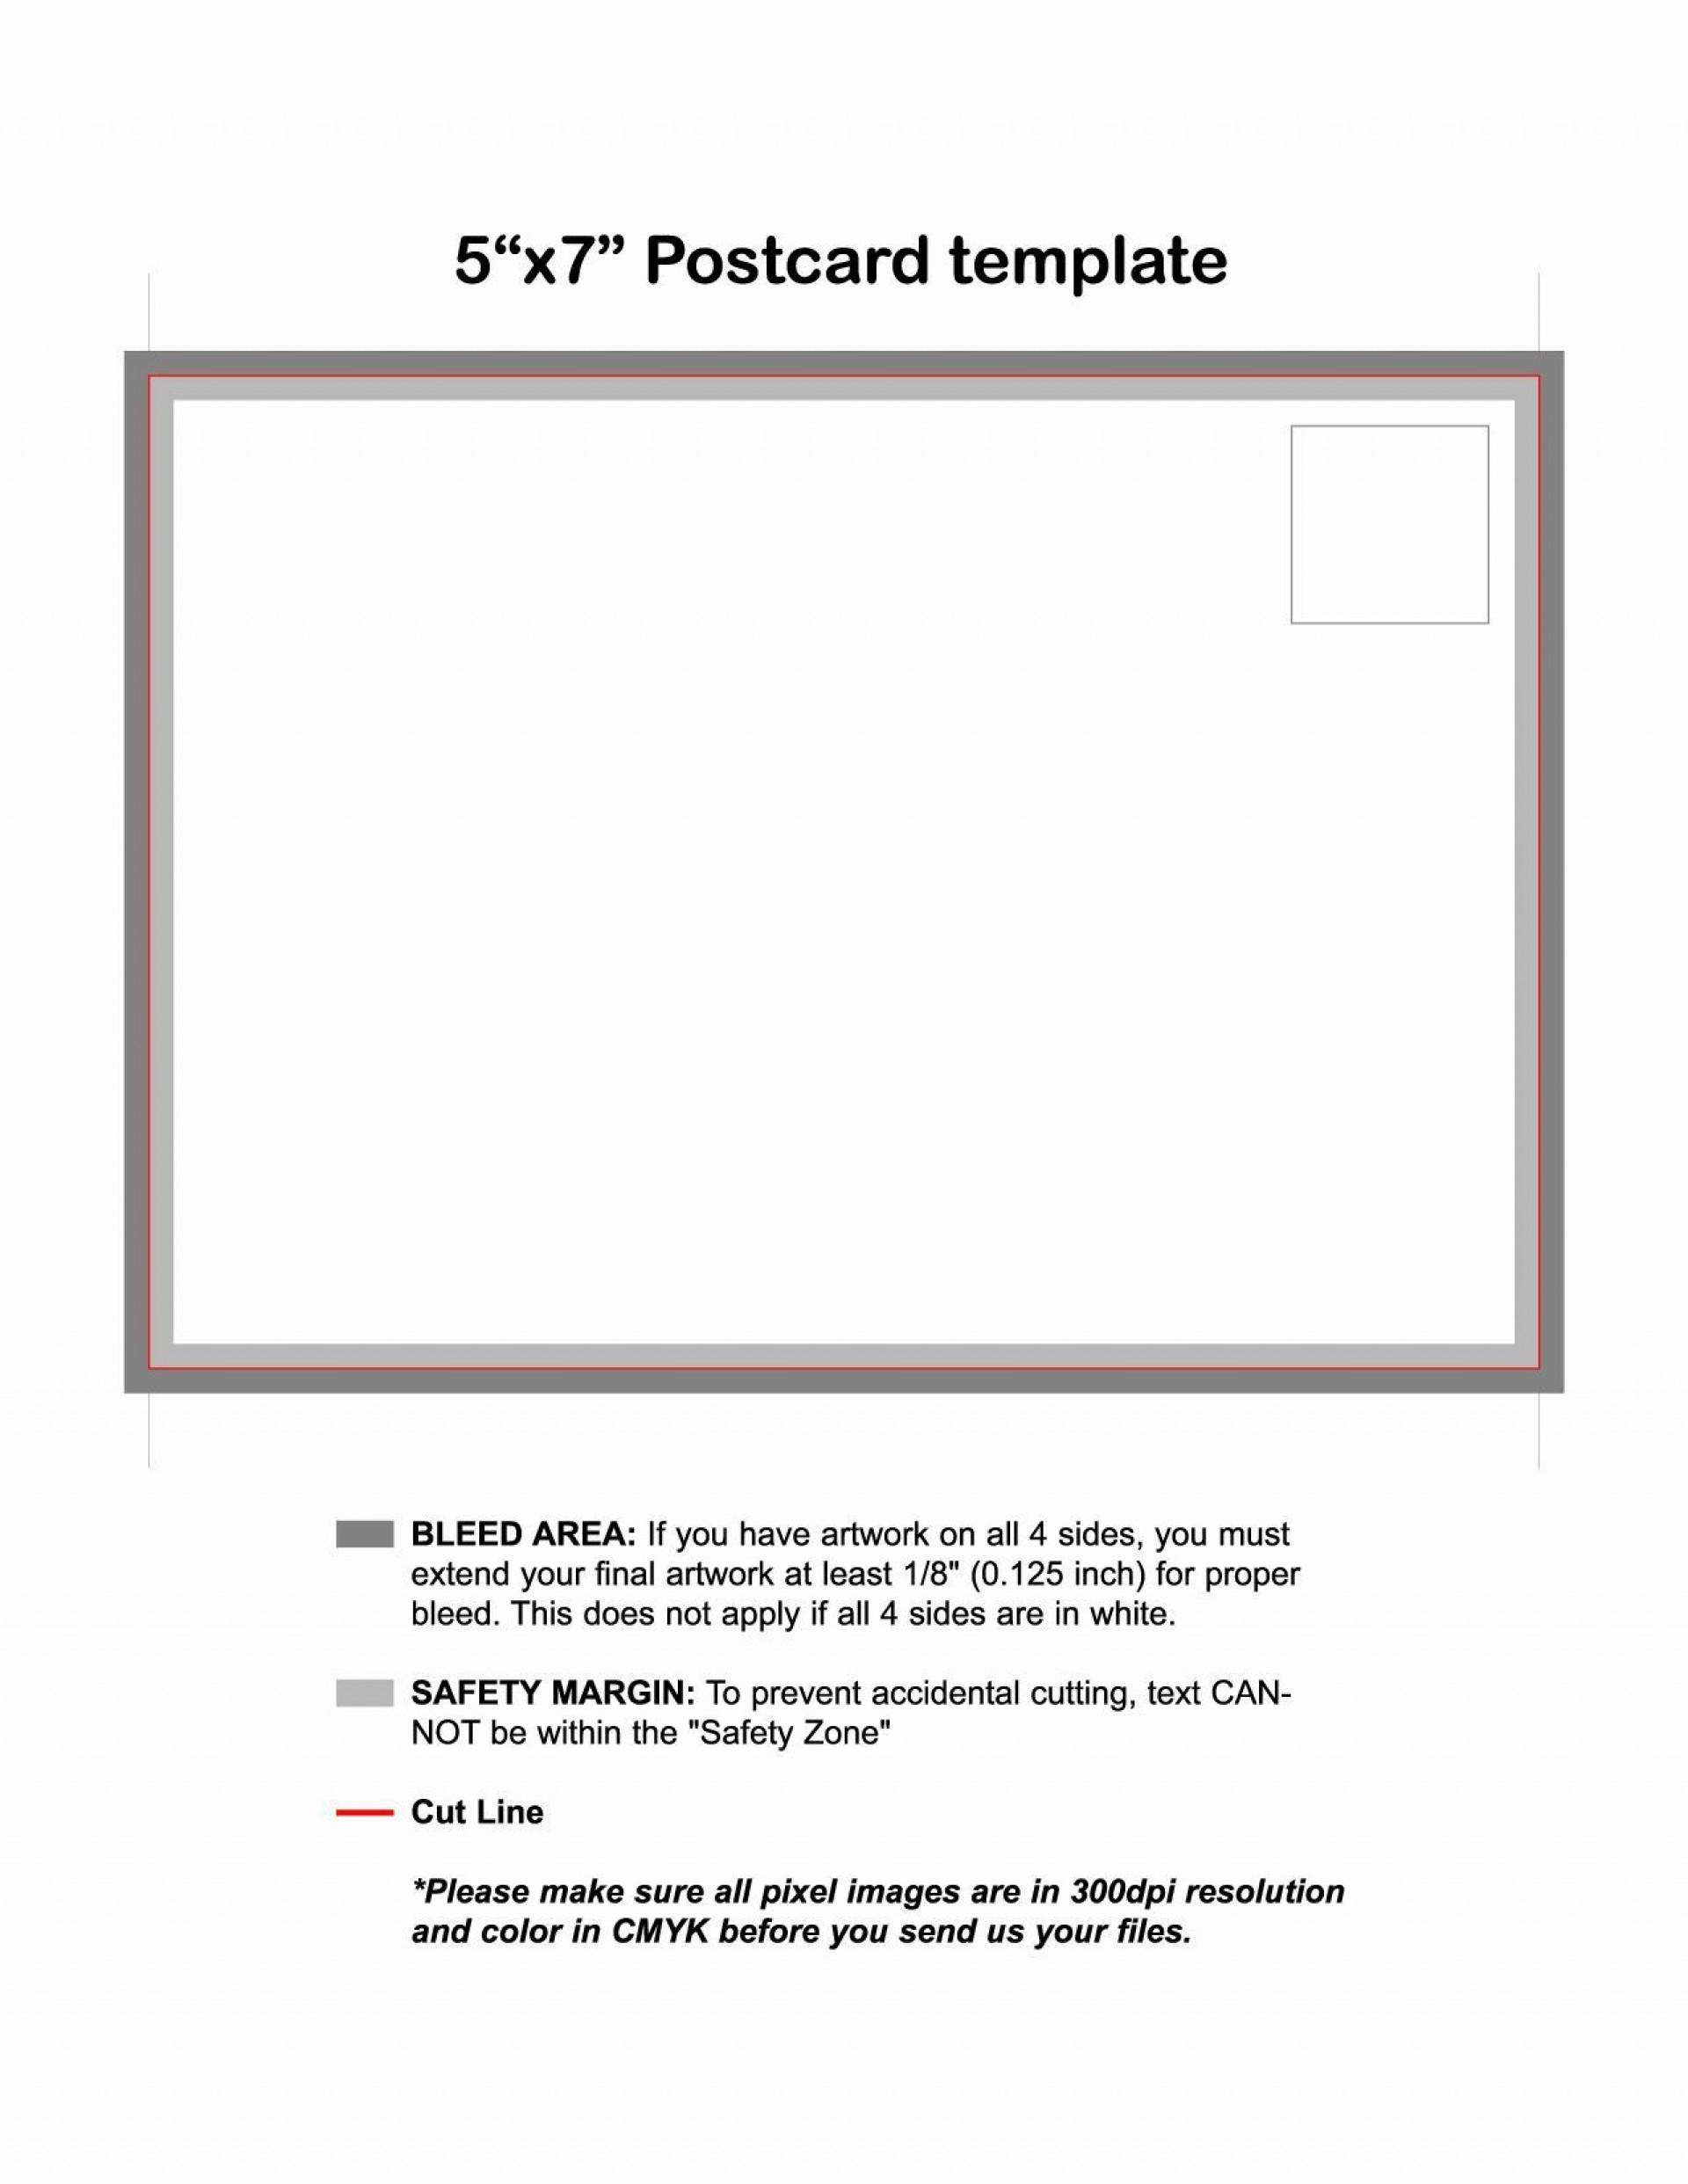 007 Unique 5 X 7 Postcard Template Microsoft Word High Definition 1920